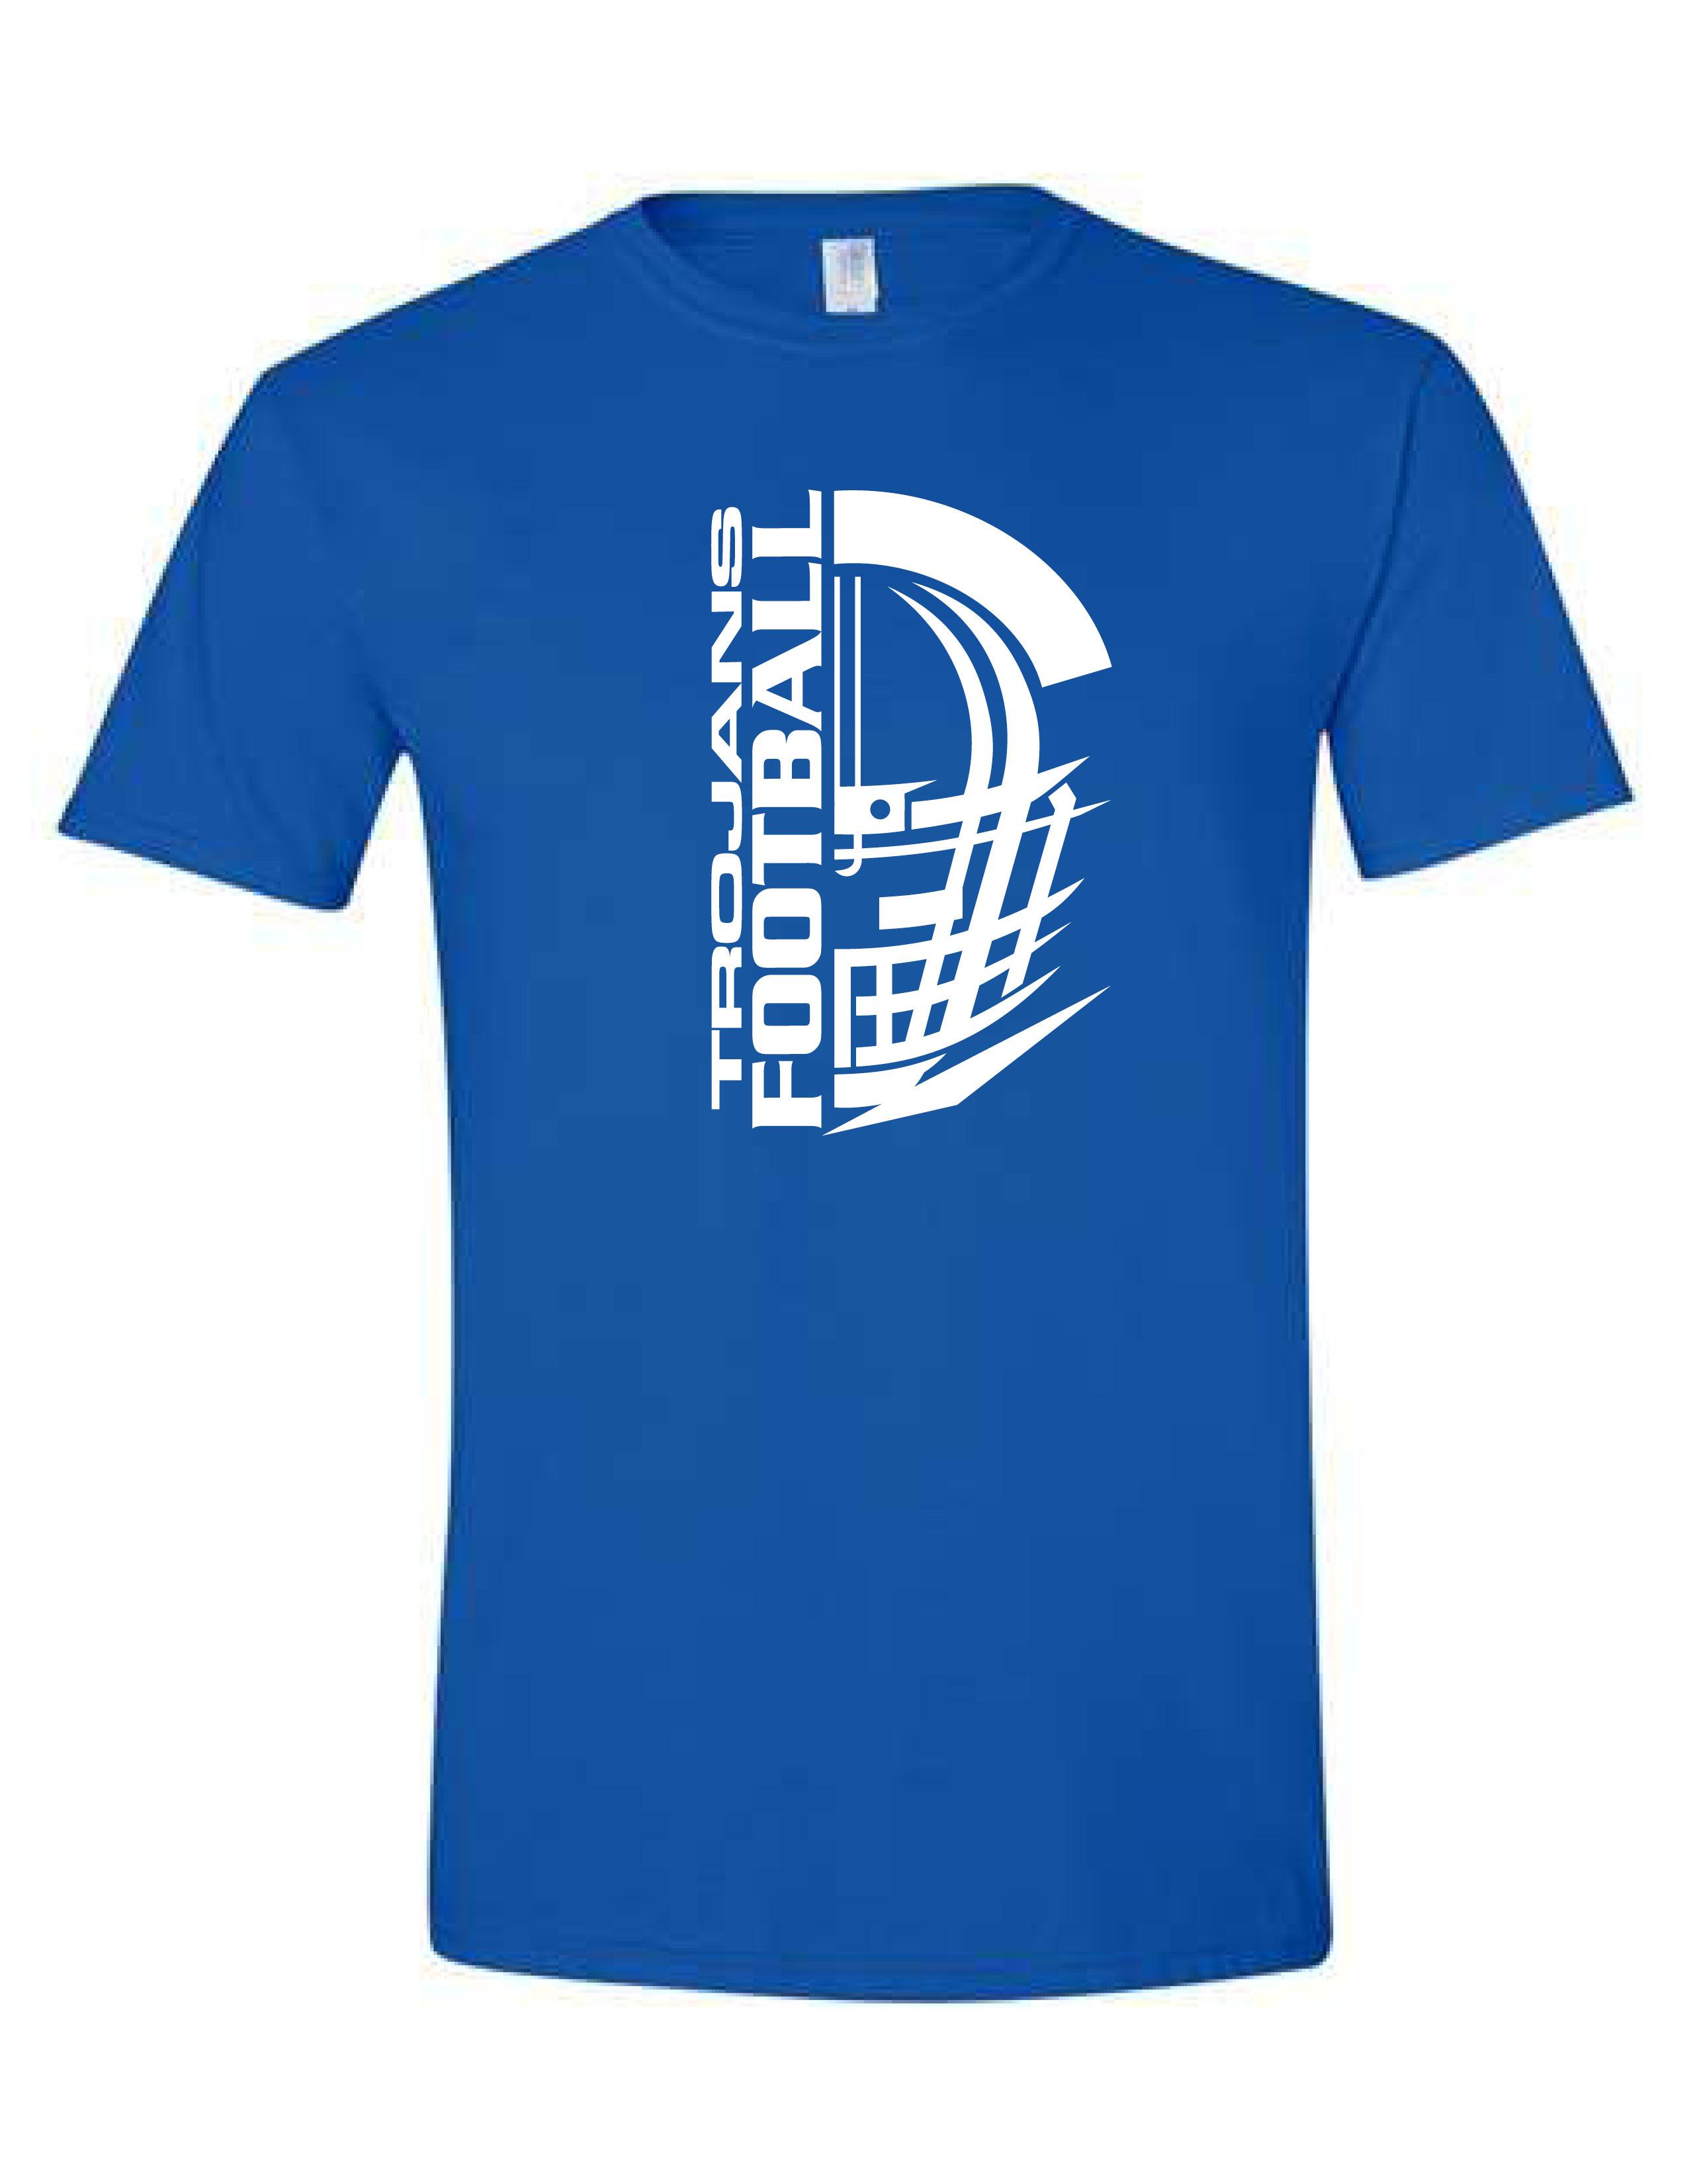 Short Sleeve T-shirt  (HELMET) (Youth sizes available)